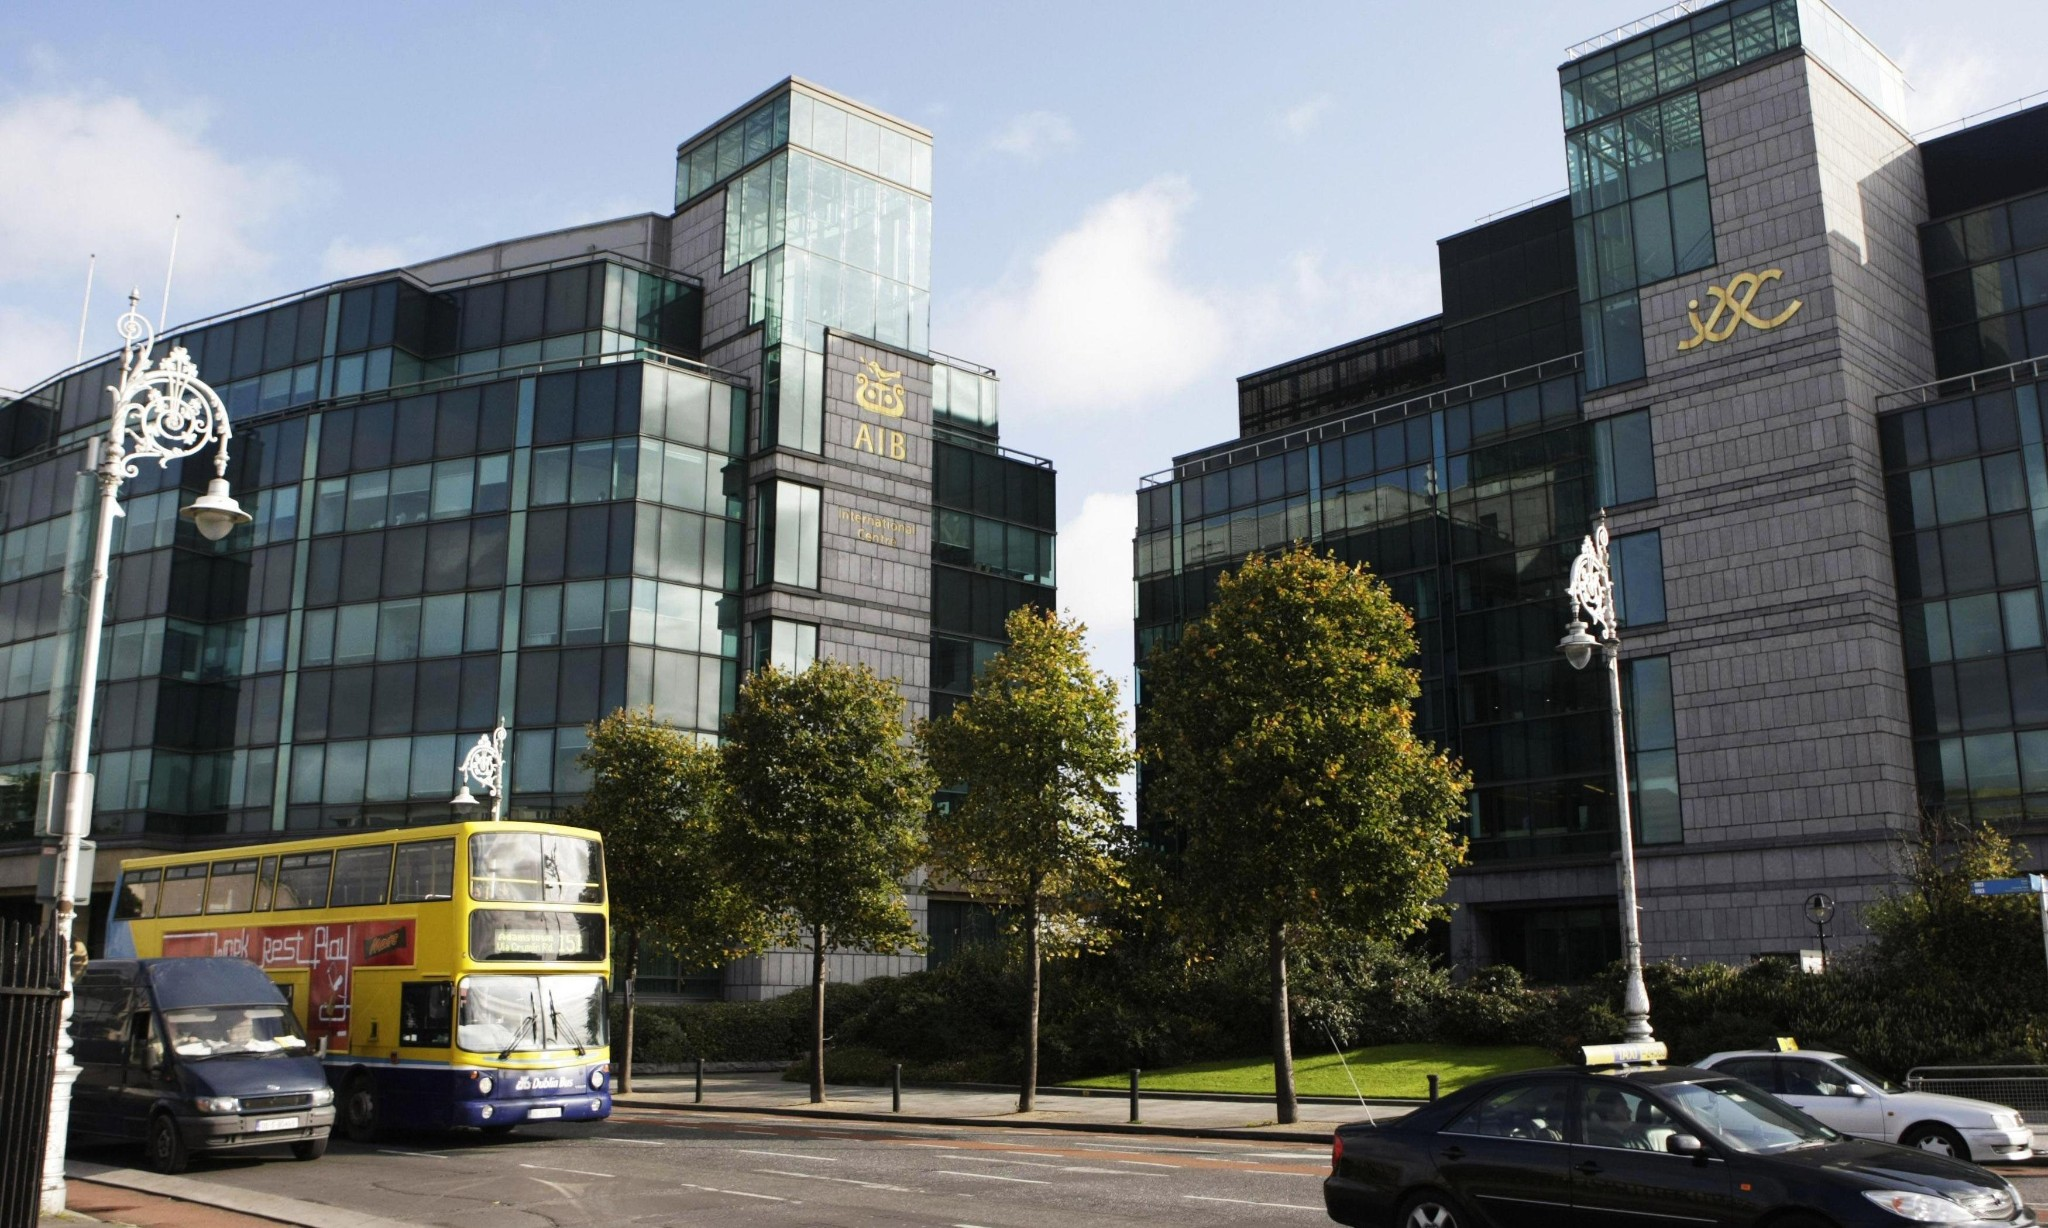 British-Irish trade network set up to offset Brexit impact